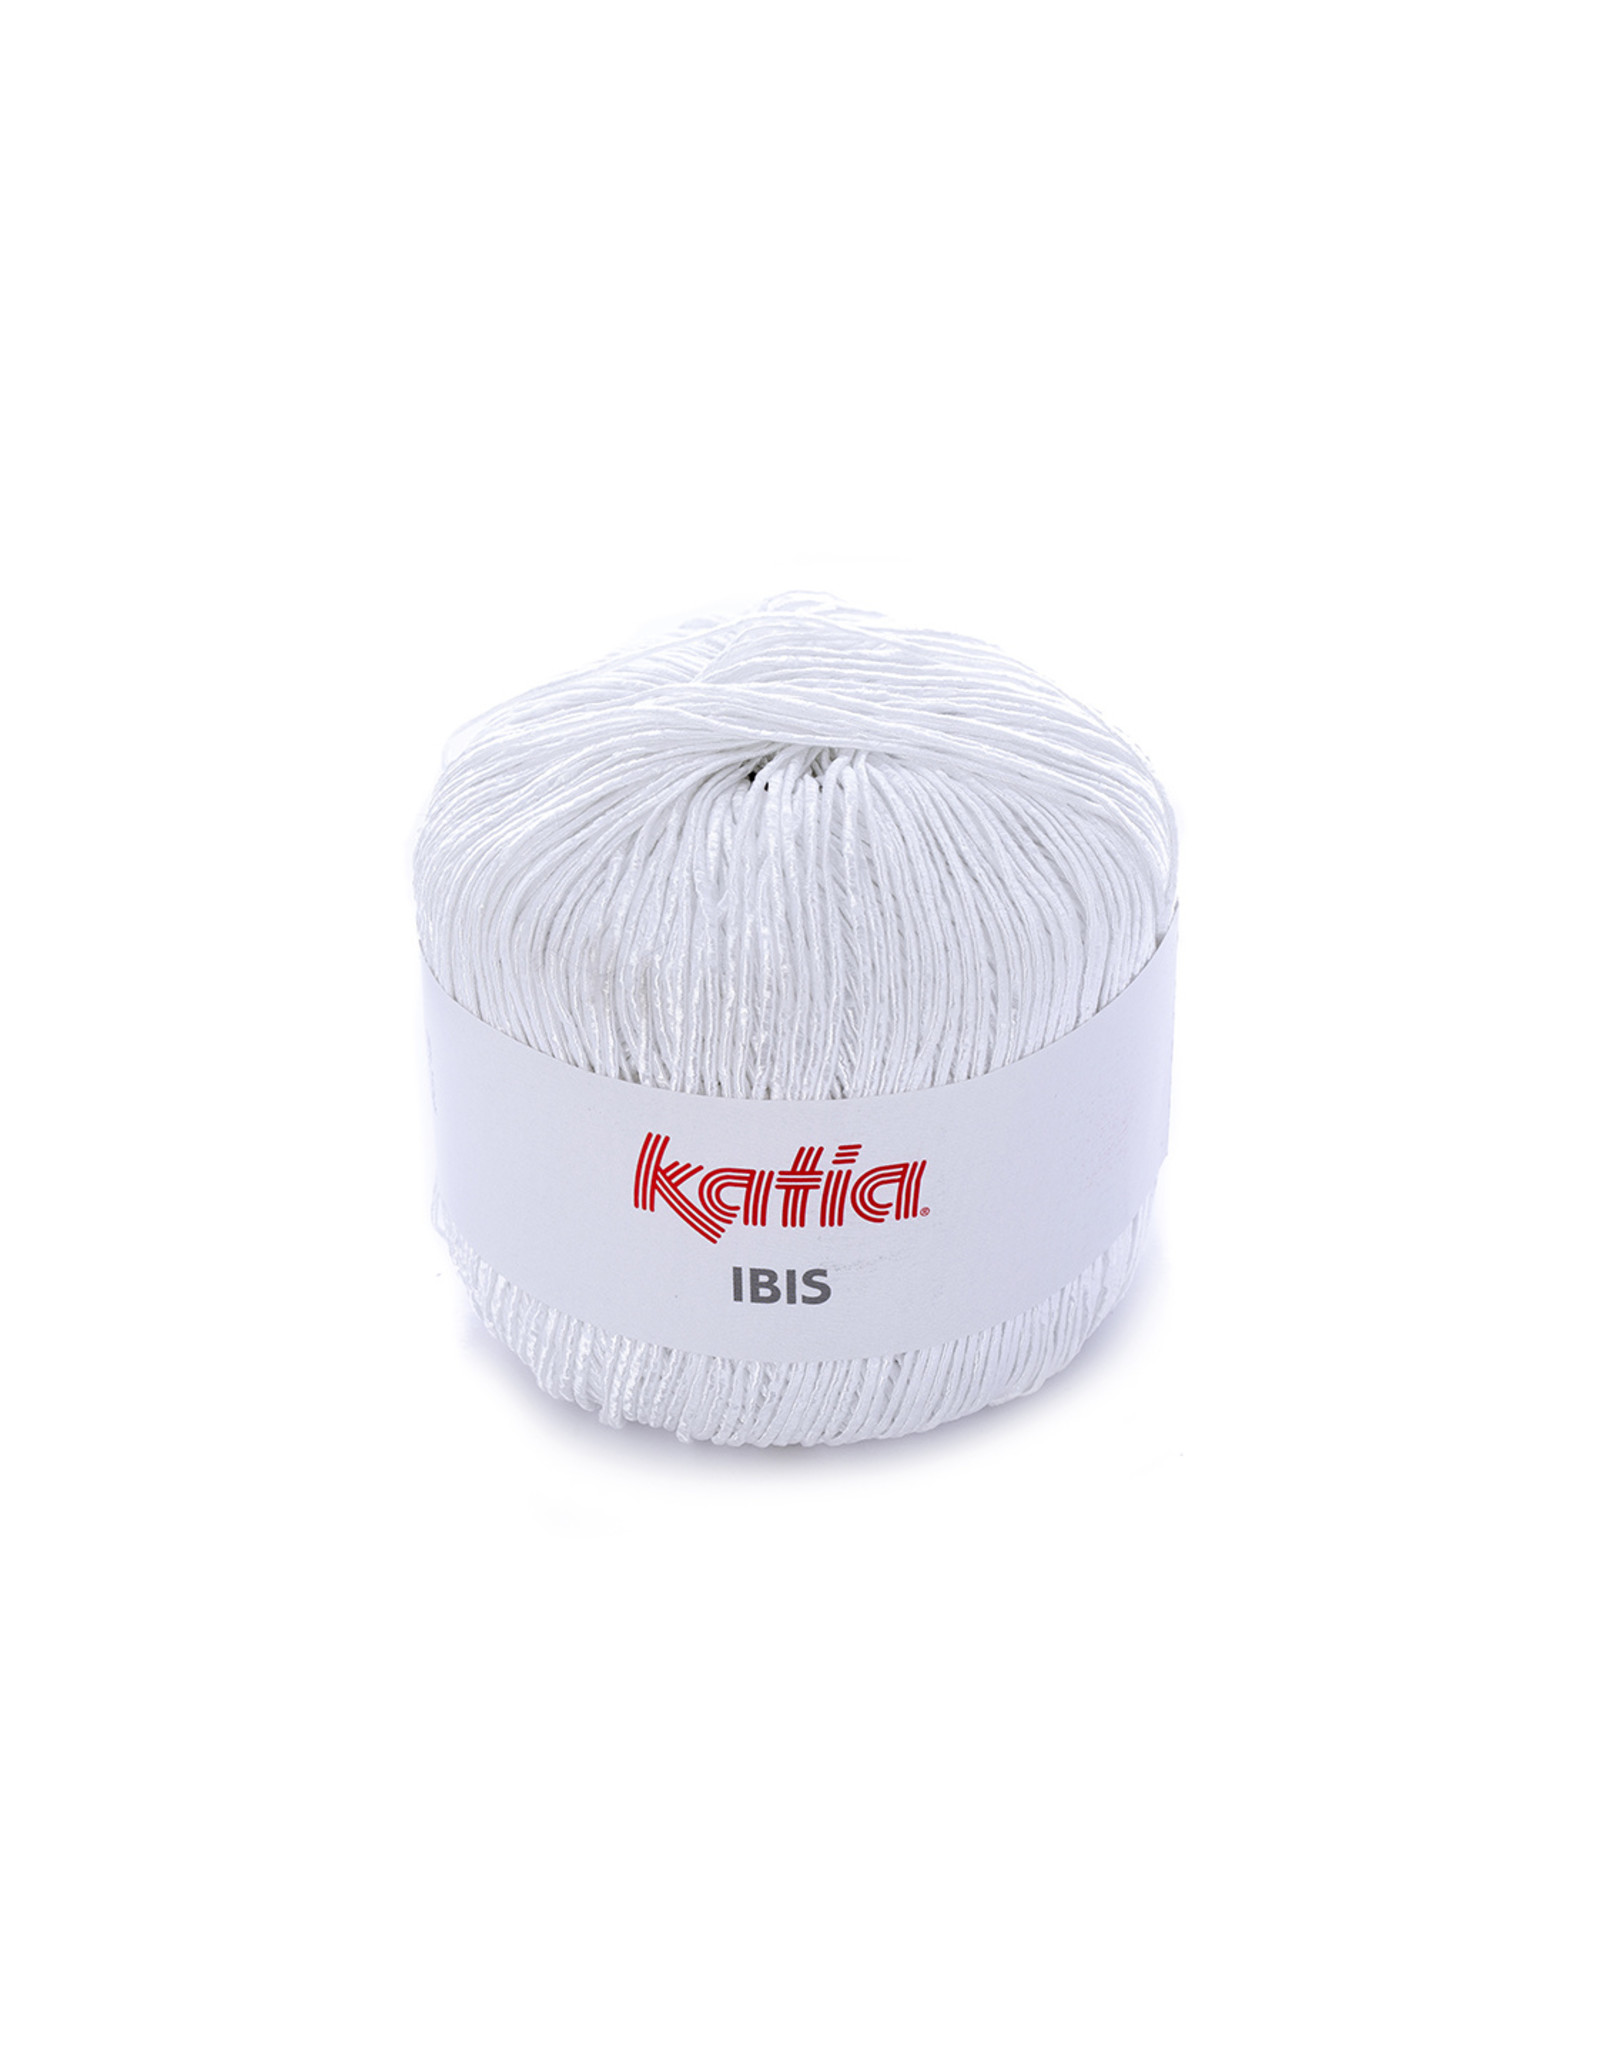 Katia Katia Ibis *